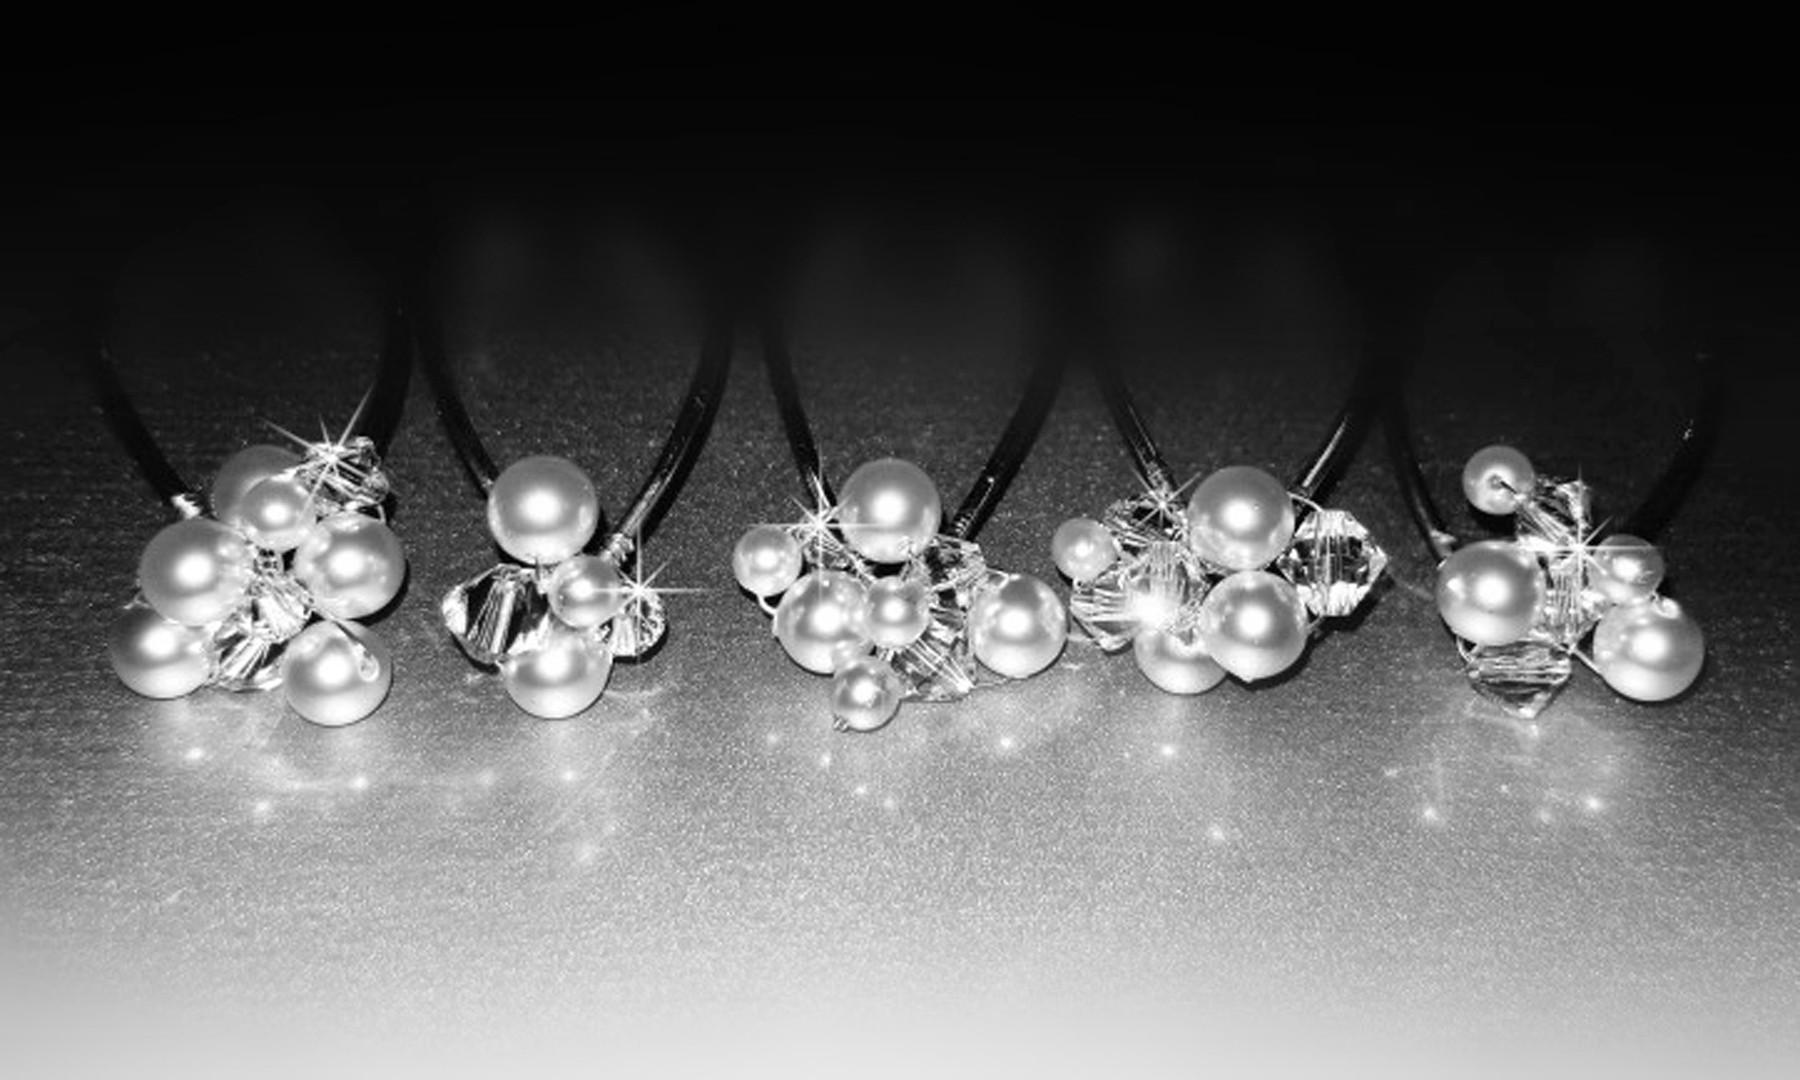 Swarovski Crystal and Pearl Cluster Brid